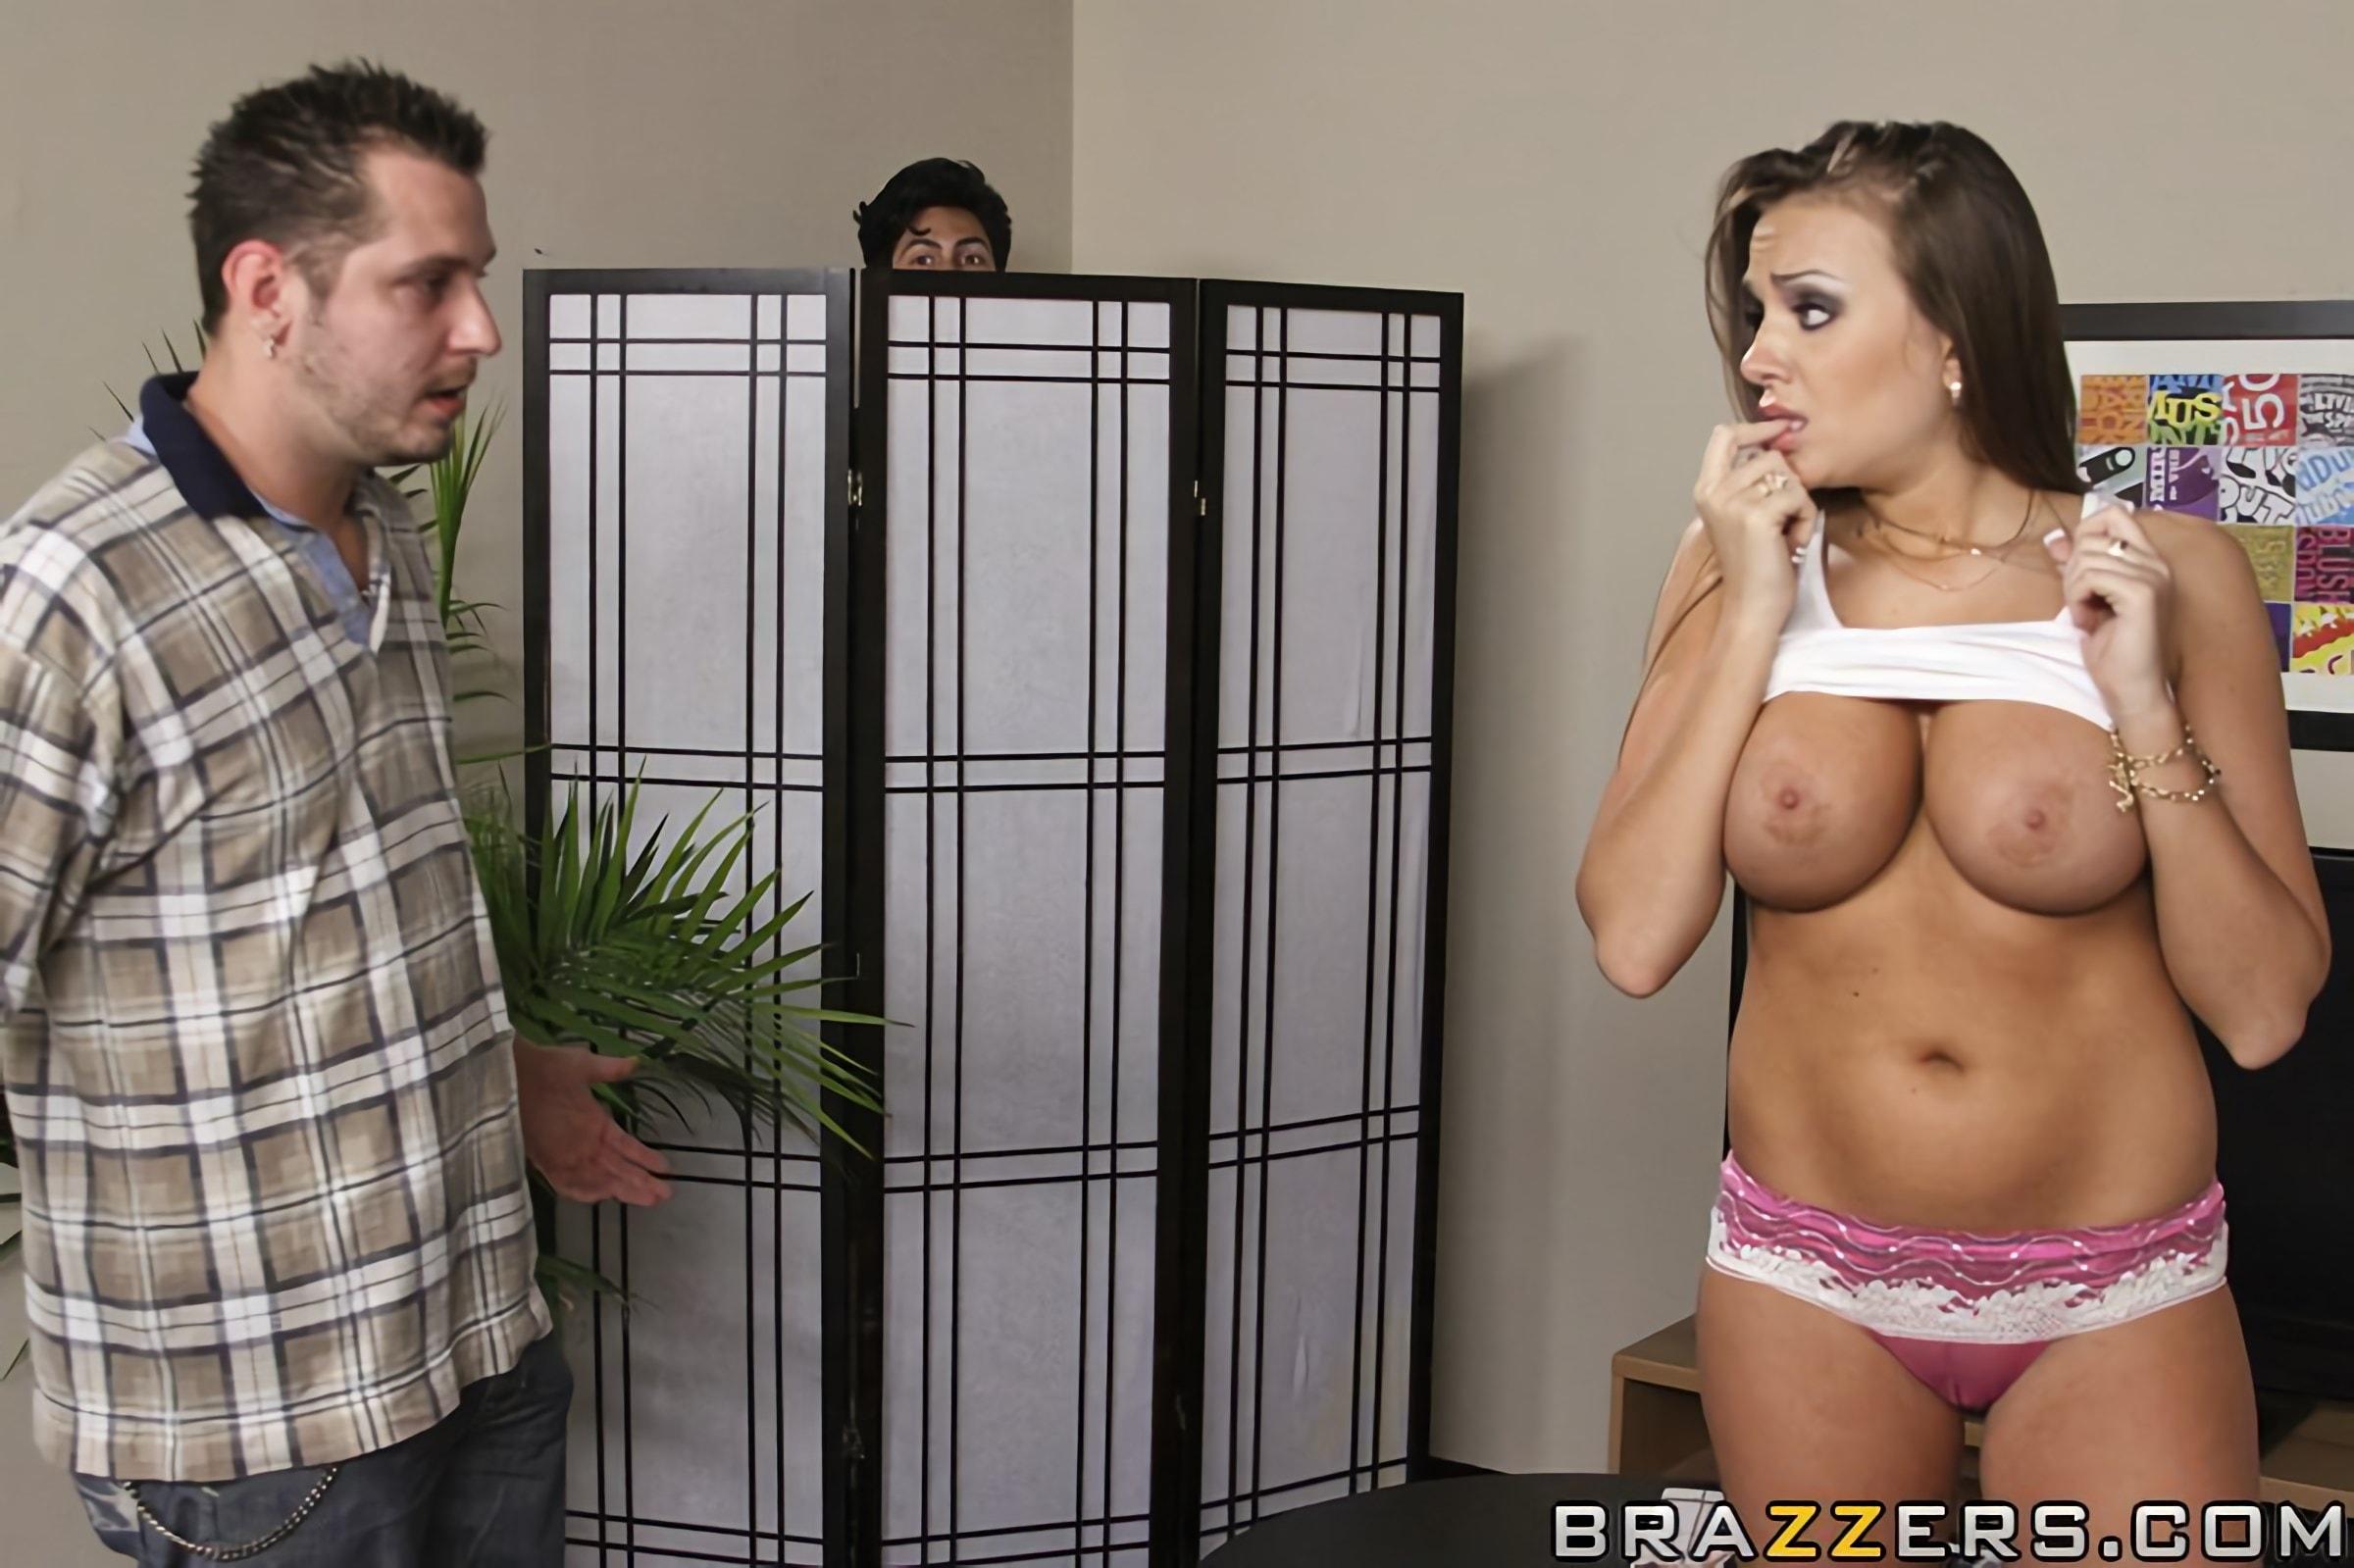 Brazzers 'Baby Sitting Cock Sucker' starring Nika Noire (Photo 5)